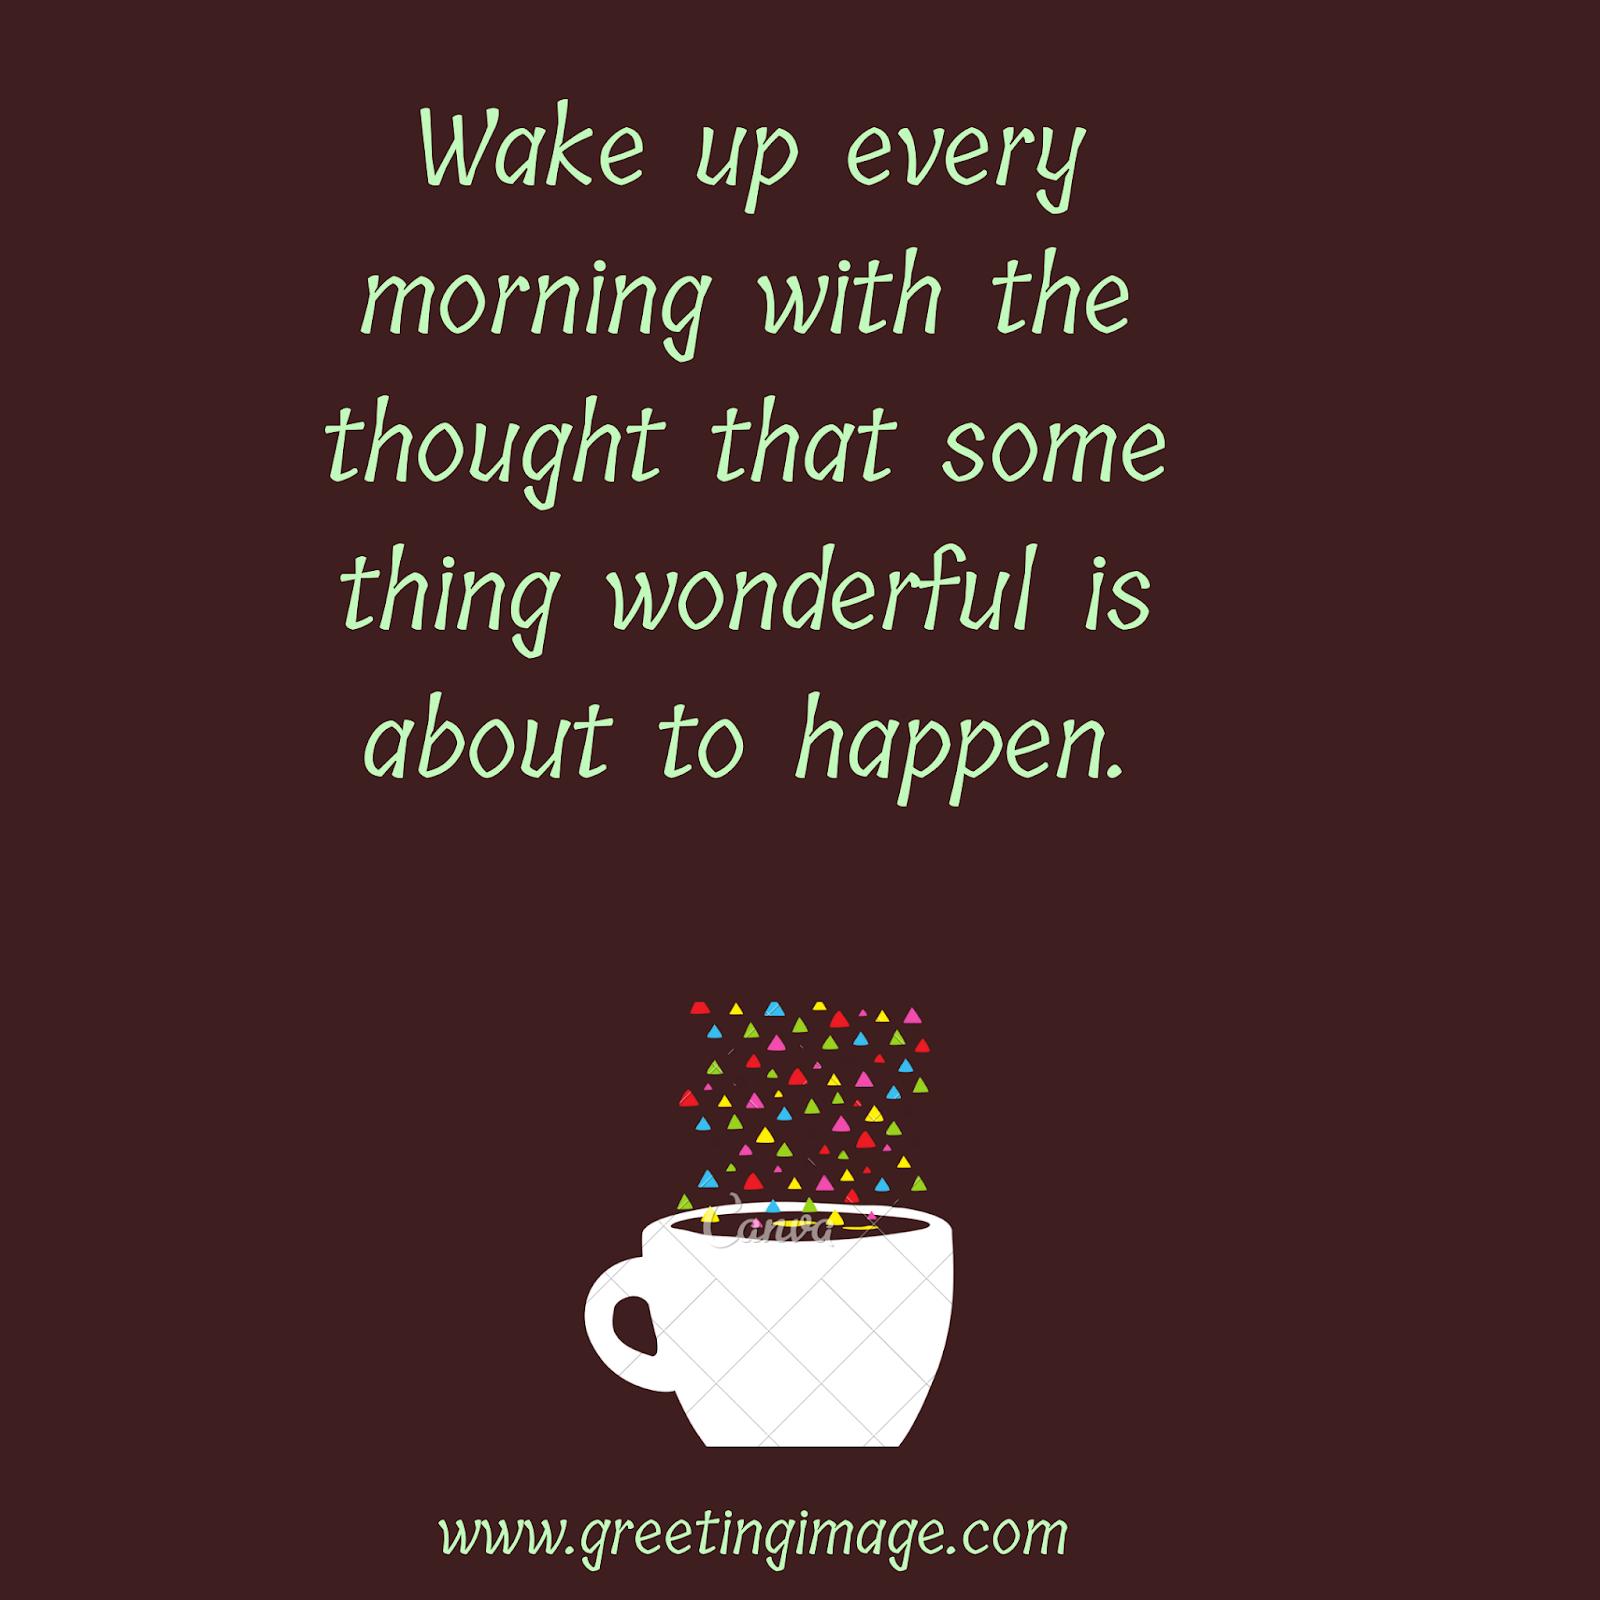 Good morning slogan Images